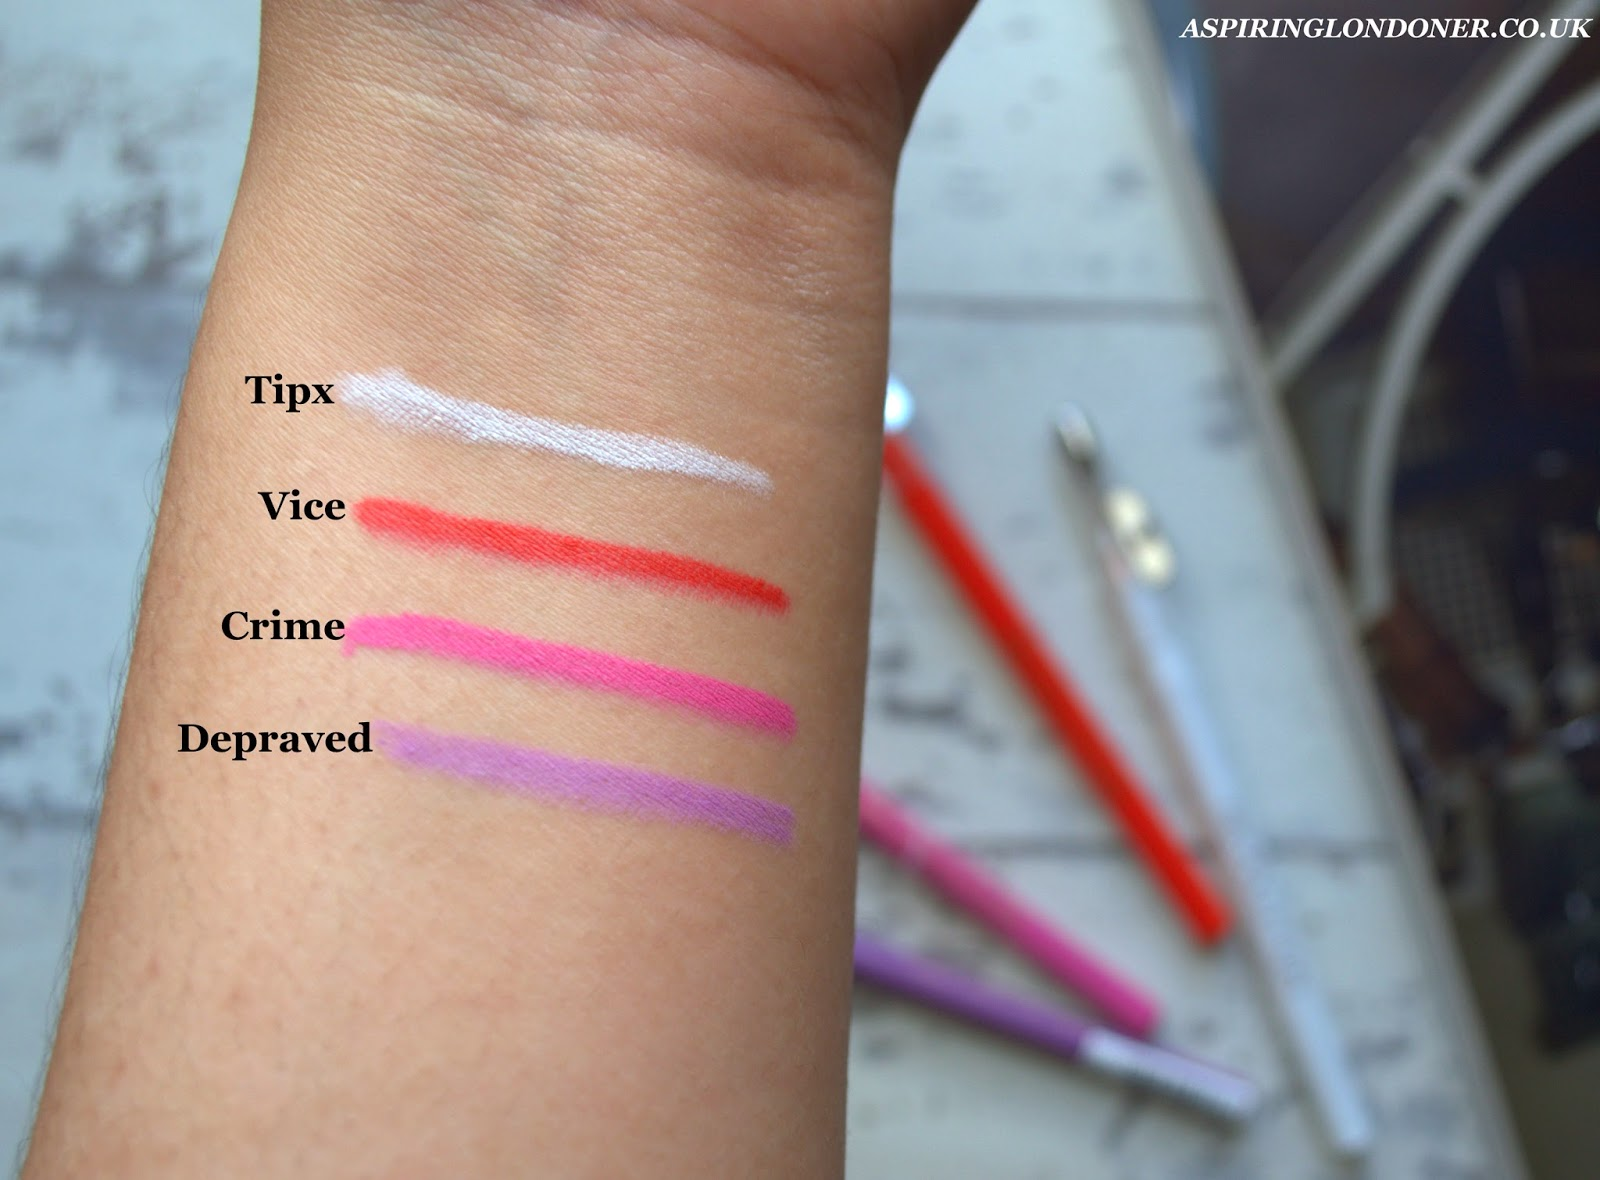 Makeup Revolution Hypocrisy Eyeliner Swatches - Aspiring Londoner